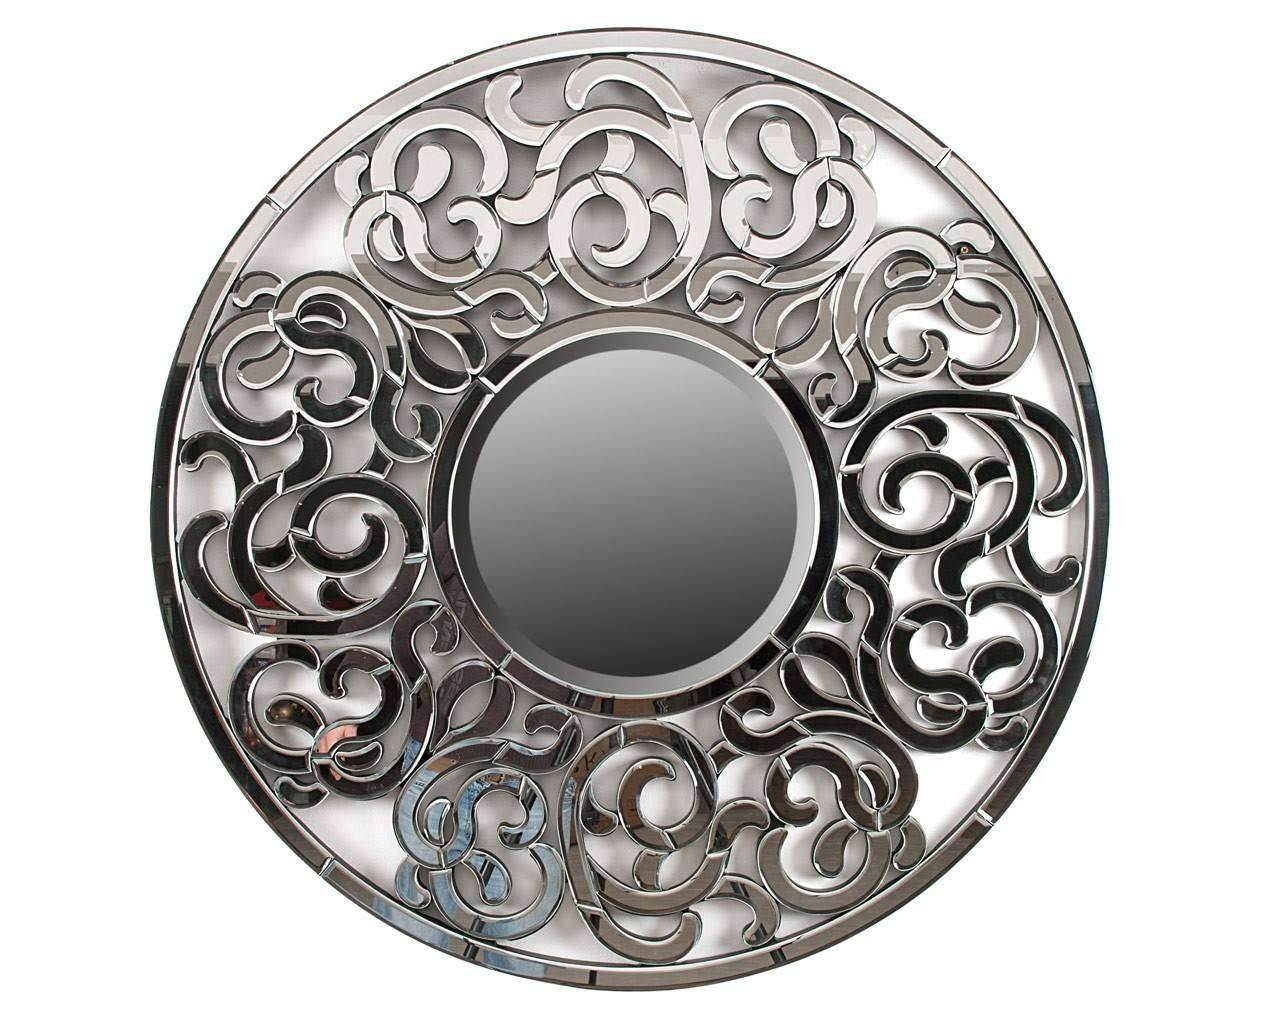 Ornate Round Mirror - Designer Wall Art - Puji Accessories inside Ornate Round Mirrors (Image 20 of 25)